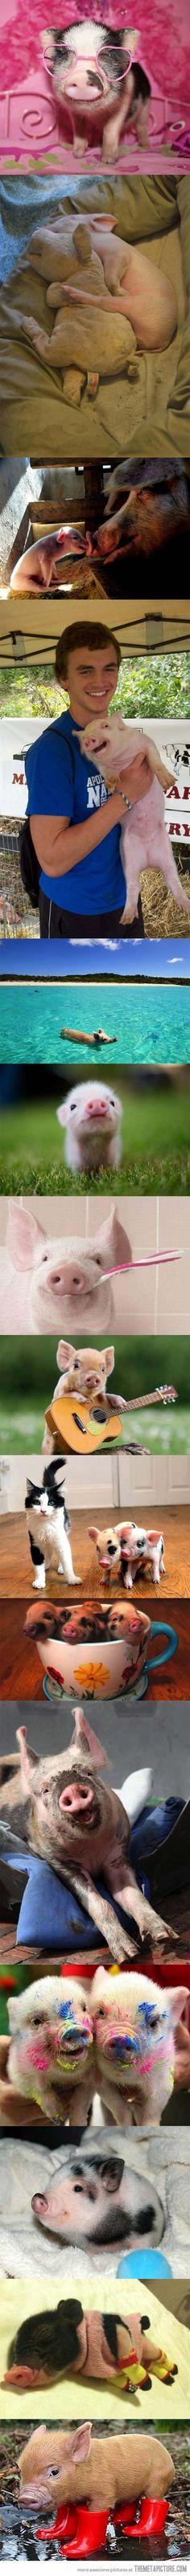 So many piggies!